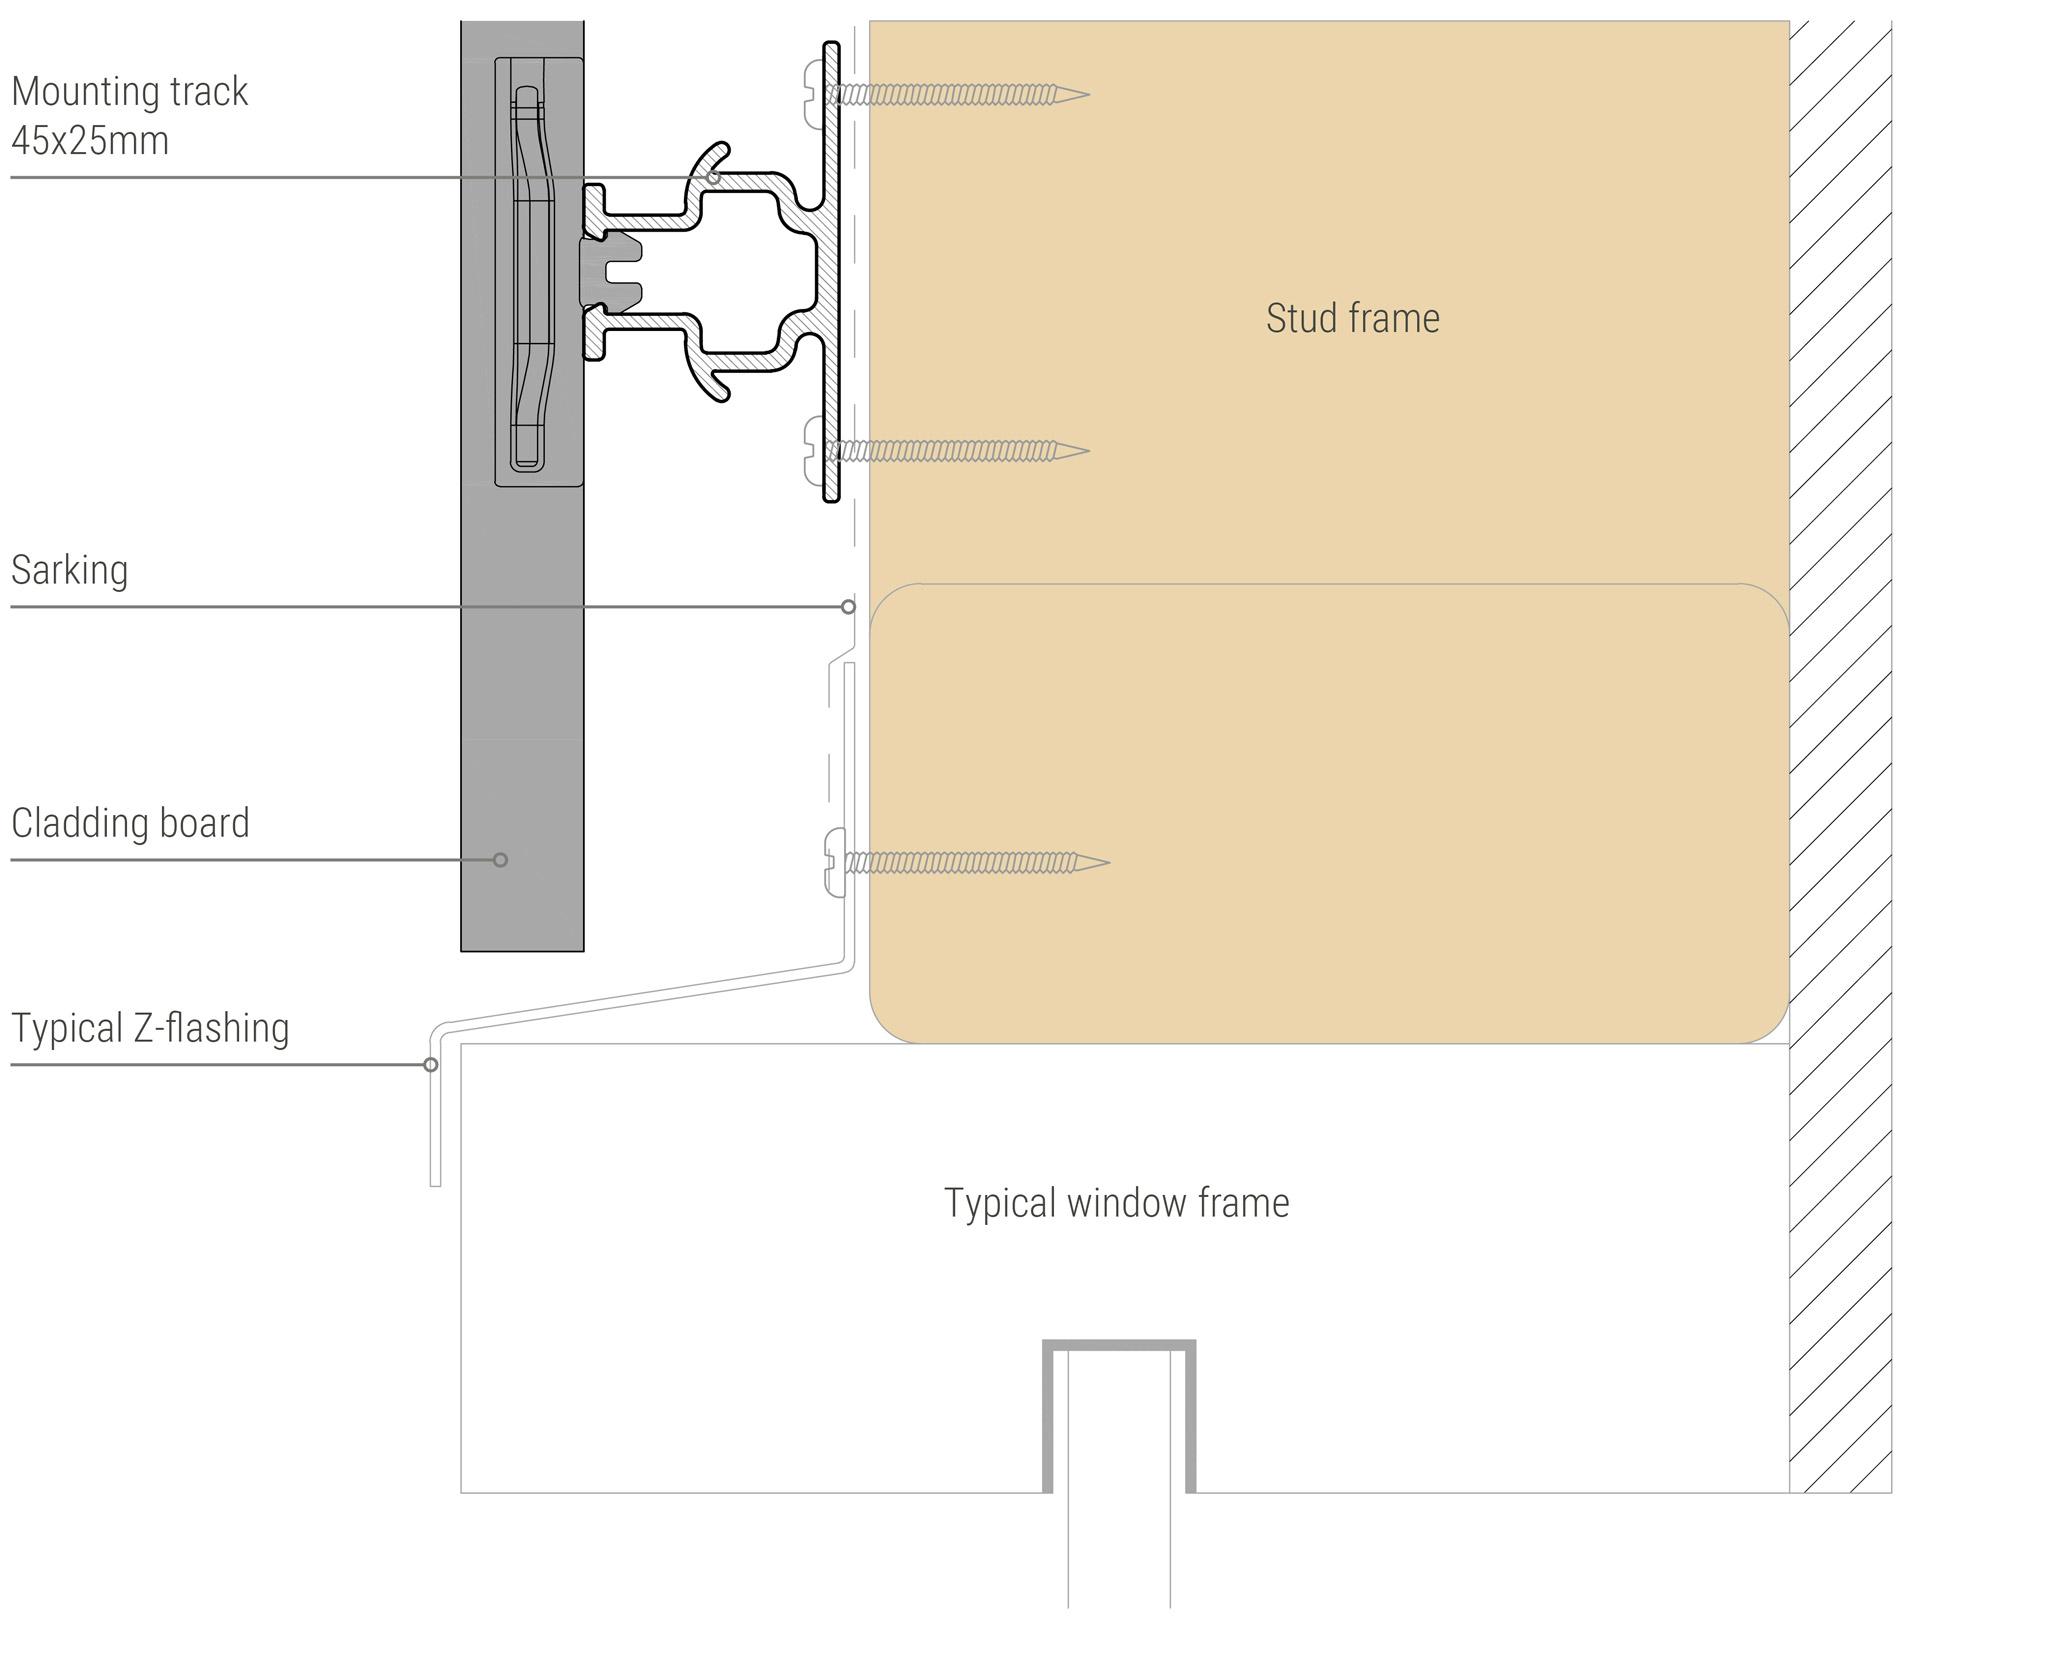 Sculptform Click-on Cladding window header detail